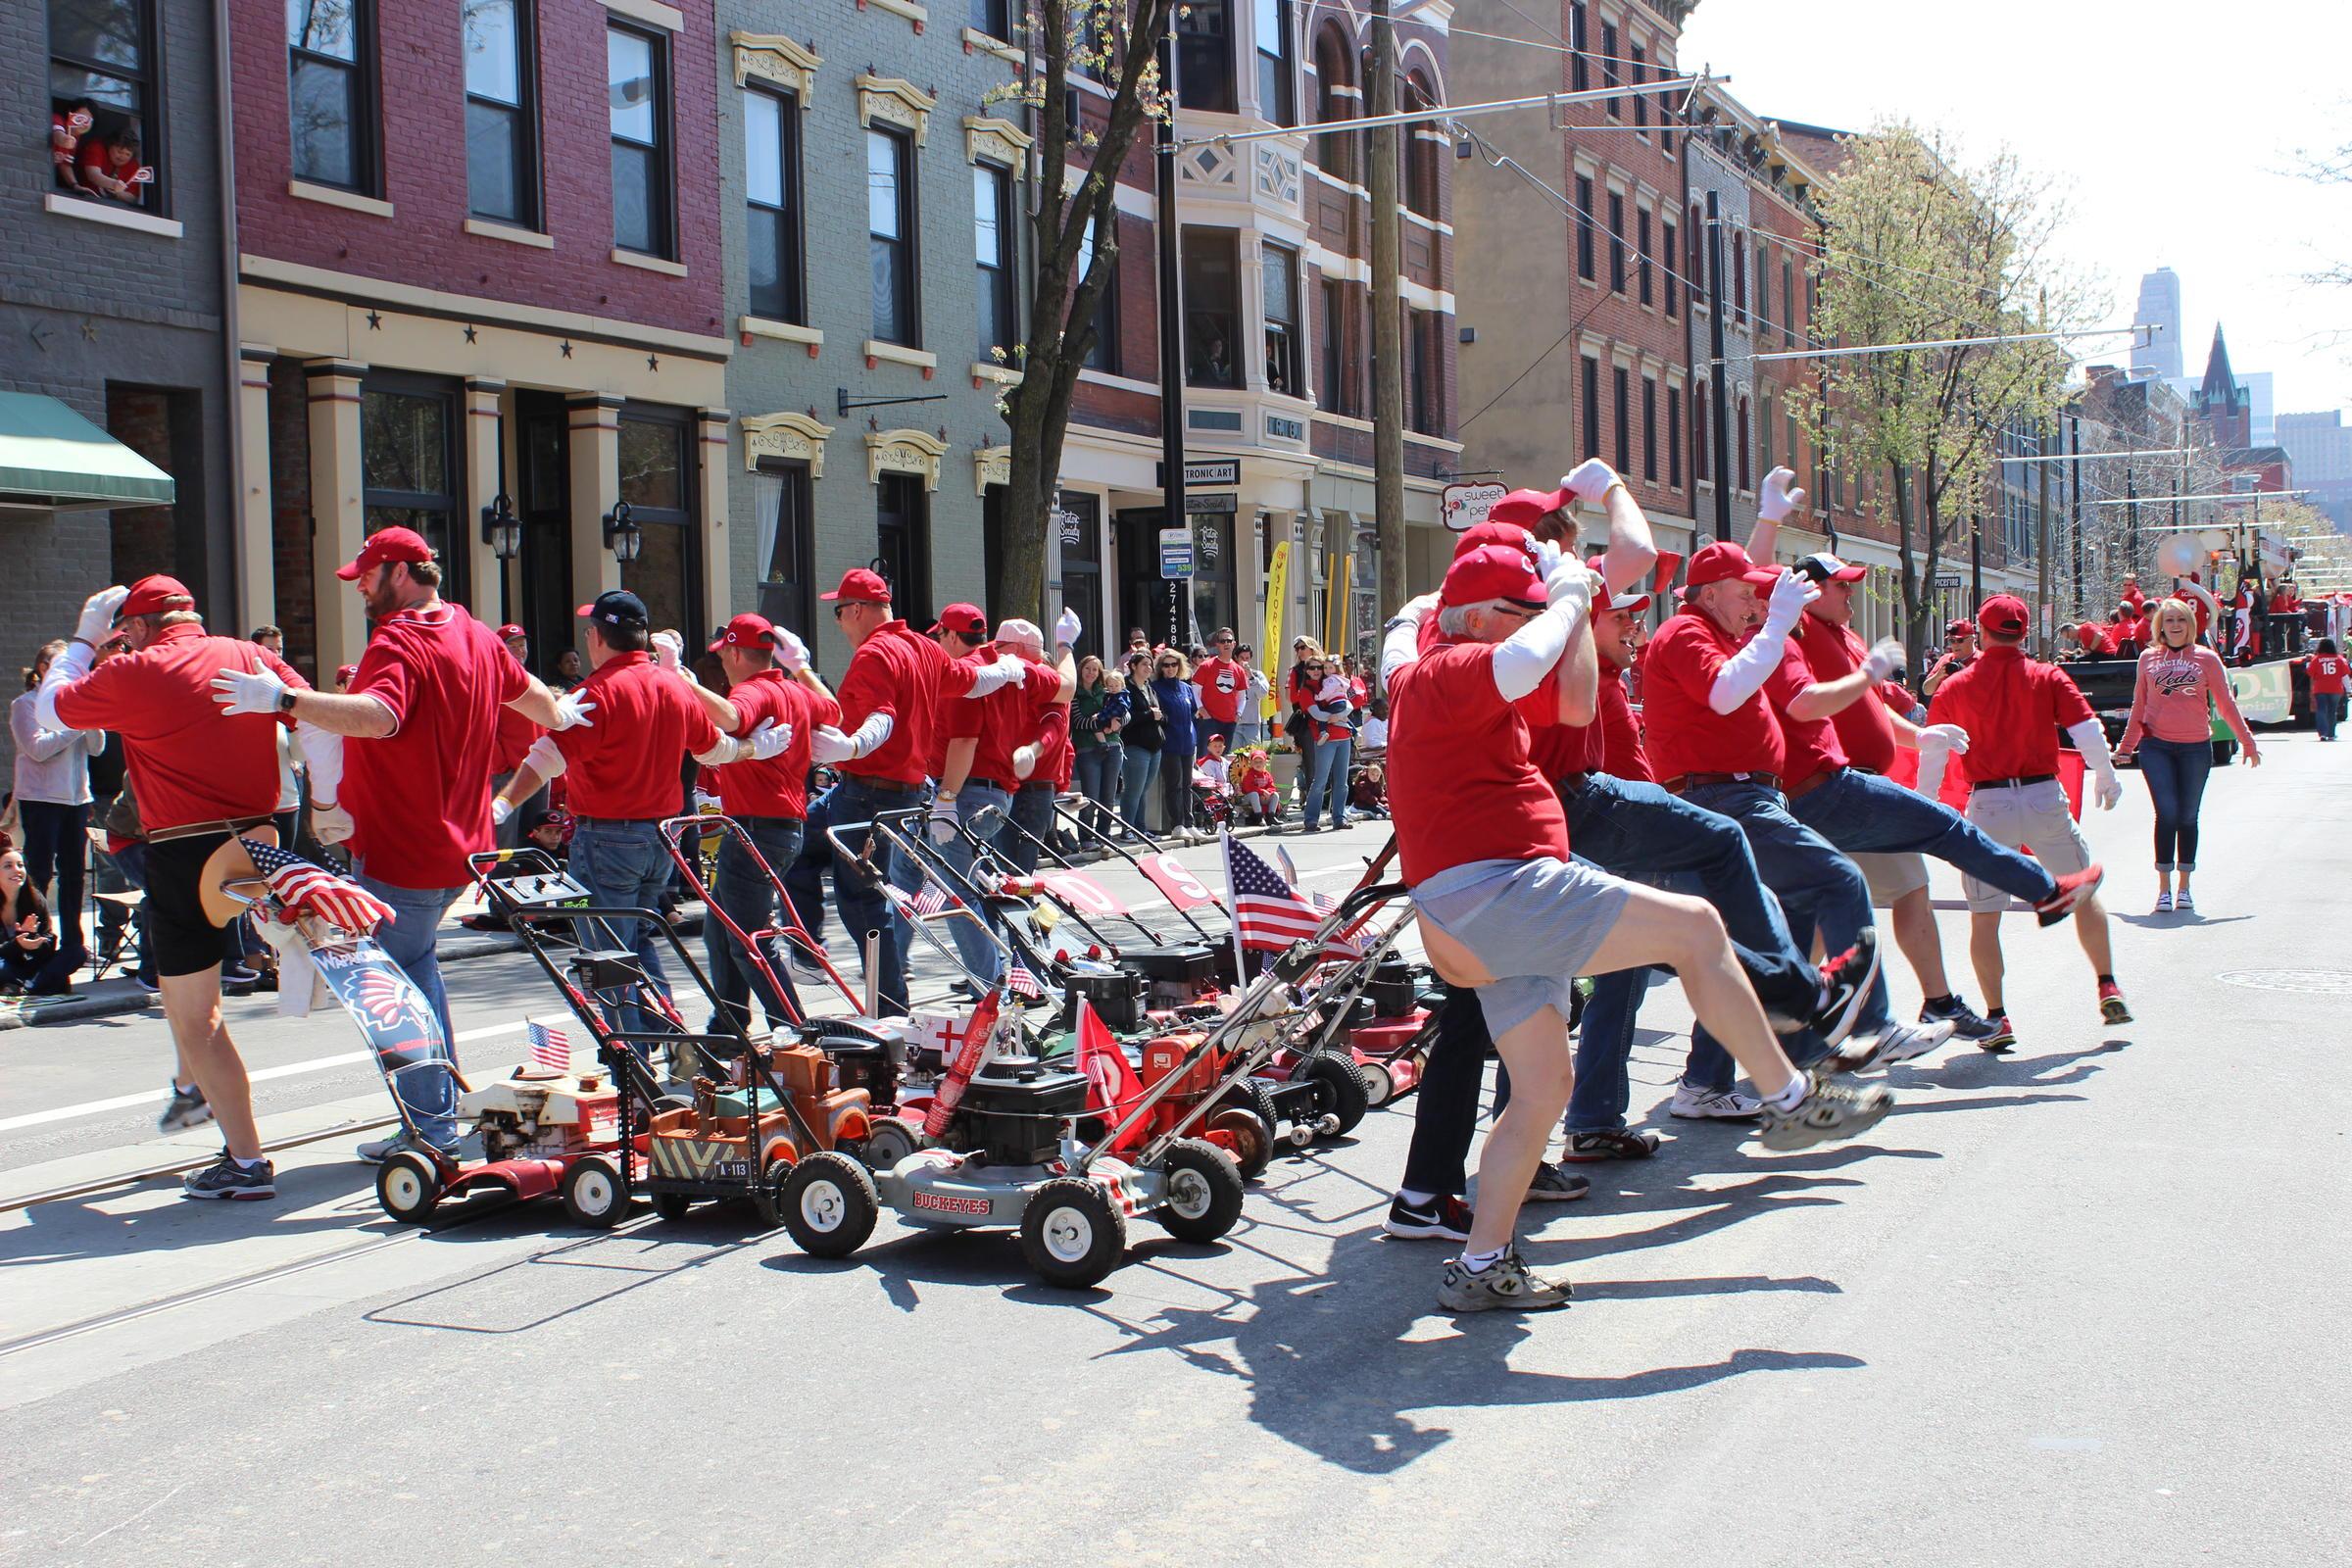 cincinnati reds opening day parade 2020